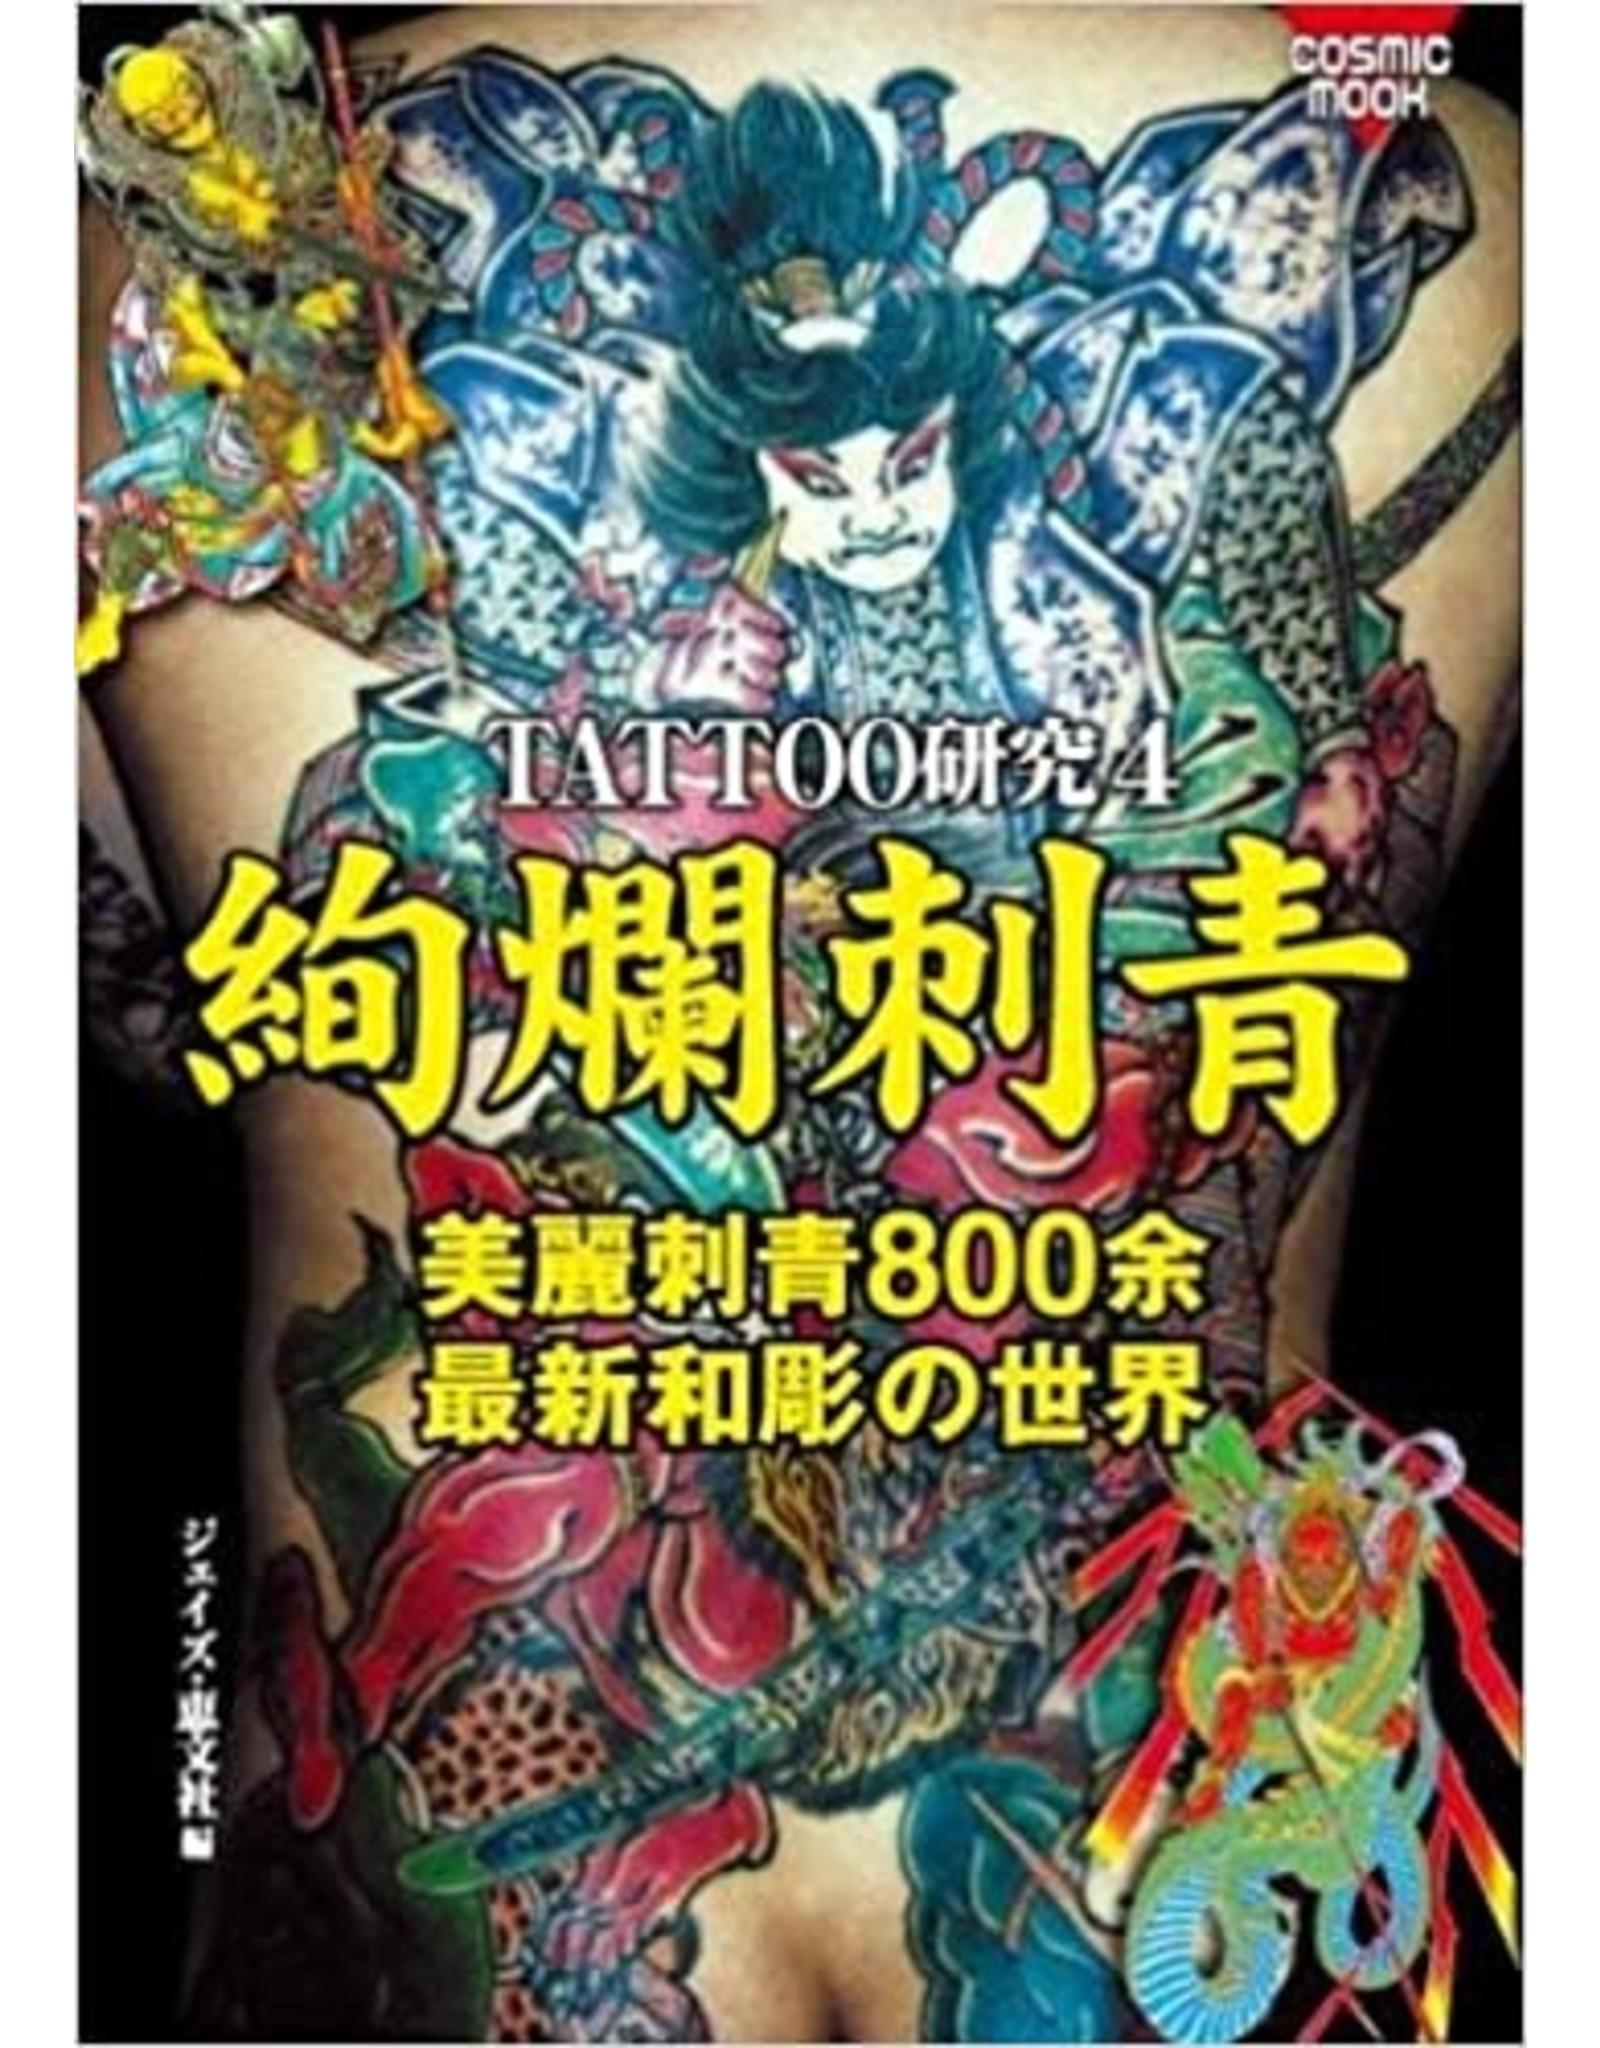 COSMIC PUBLISHING TATTOO KENKYU VOL. 4